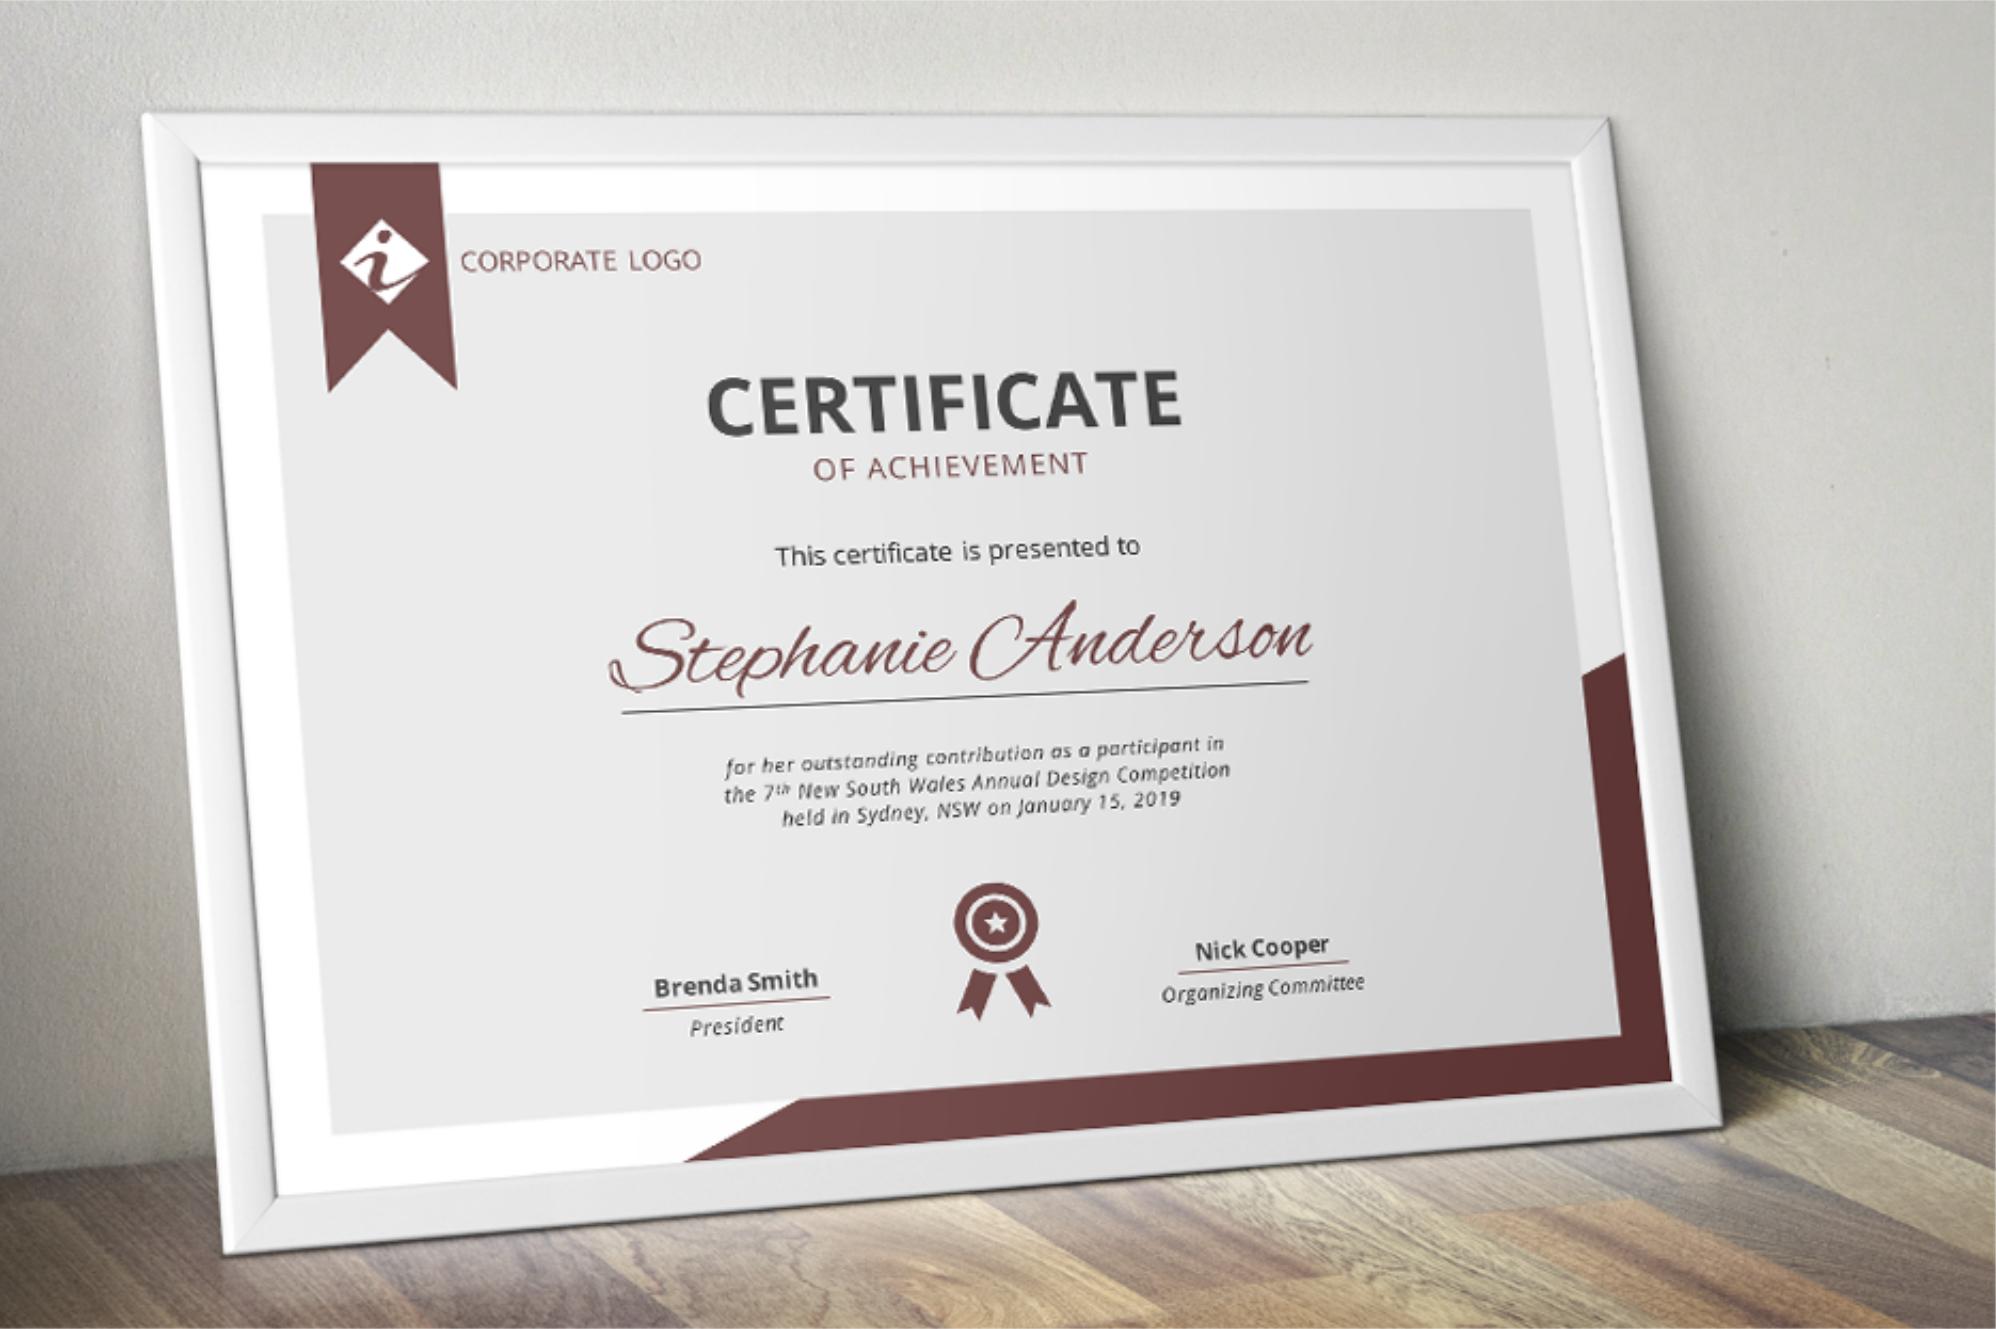 certificate word template templates designer brilliant presentation layout advertise ways achievement inkpower ms license follow xfanzexpo